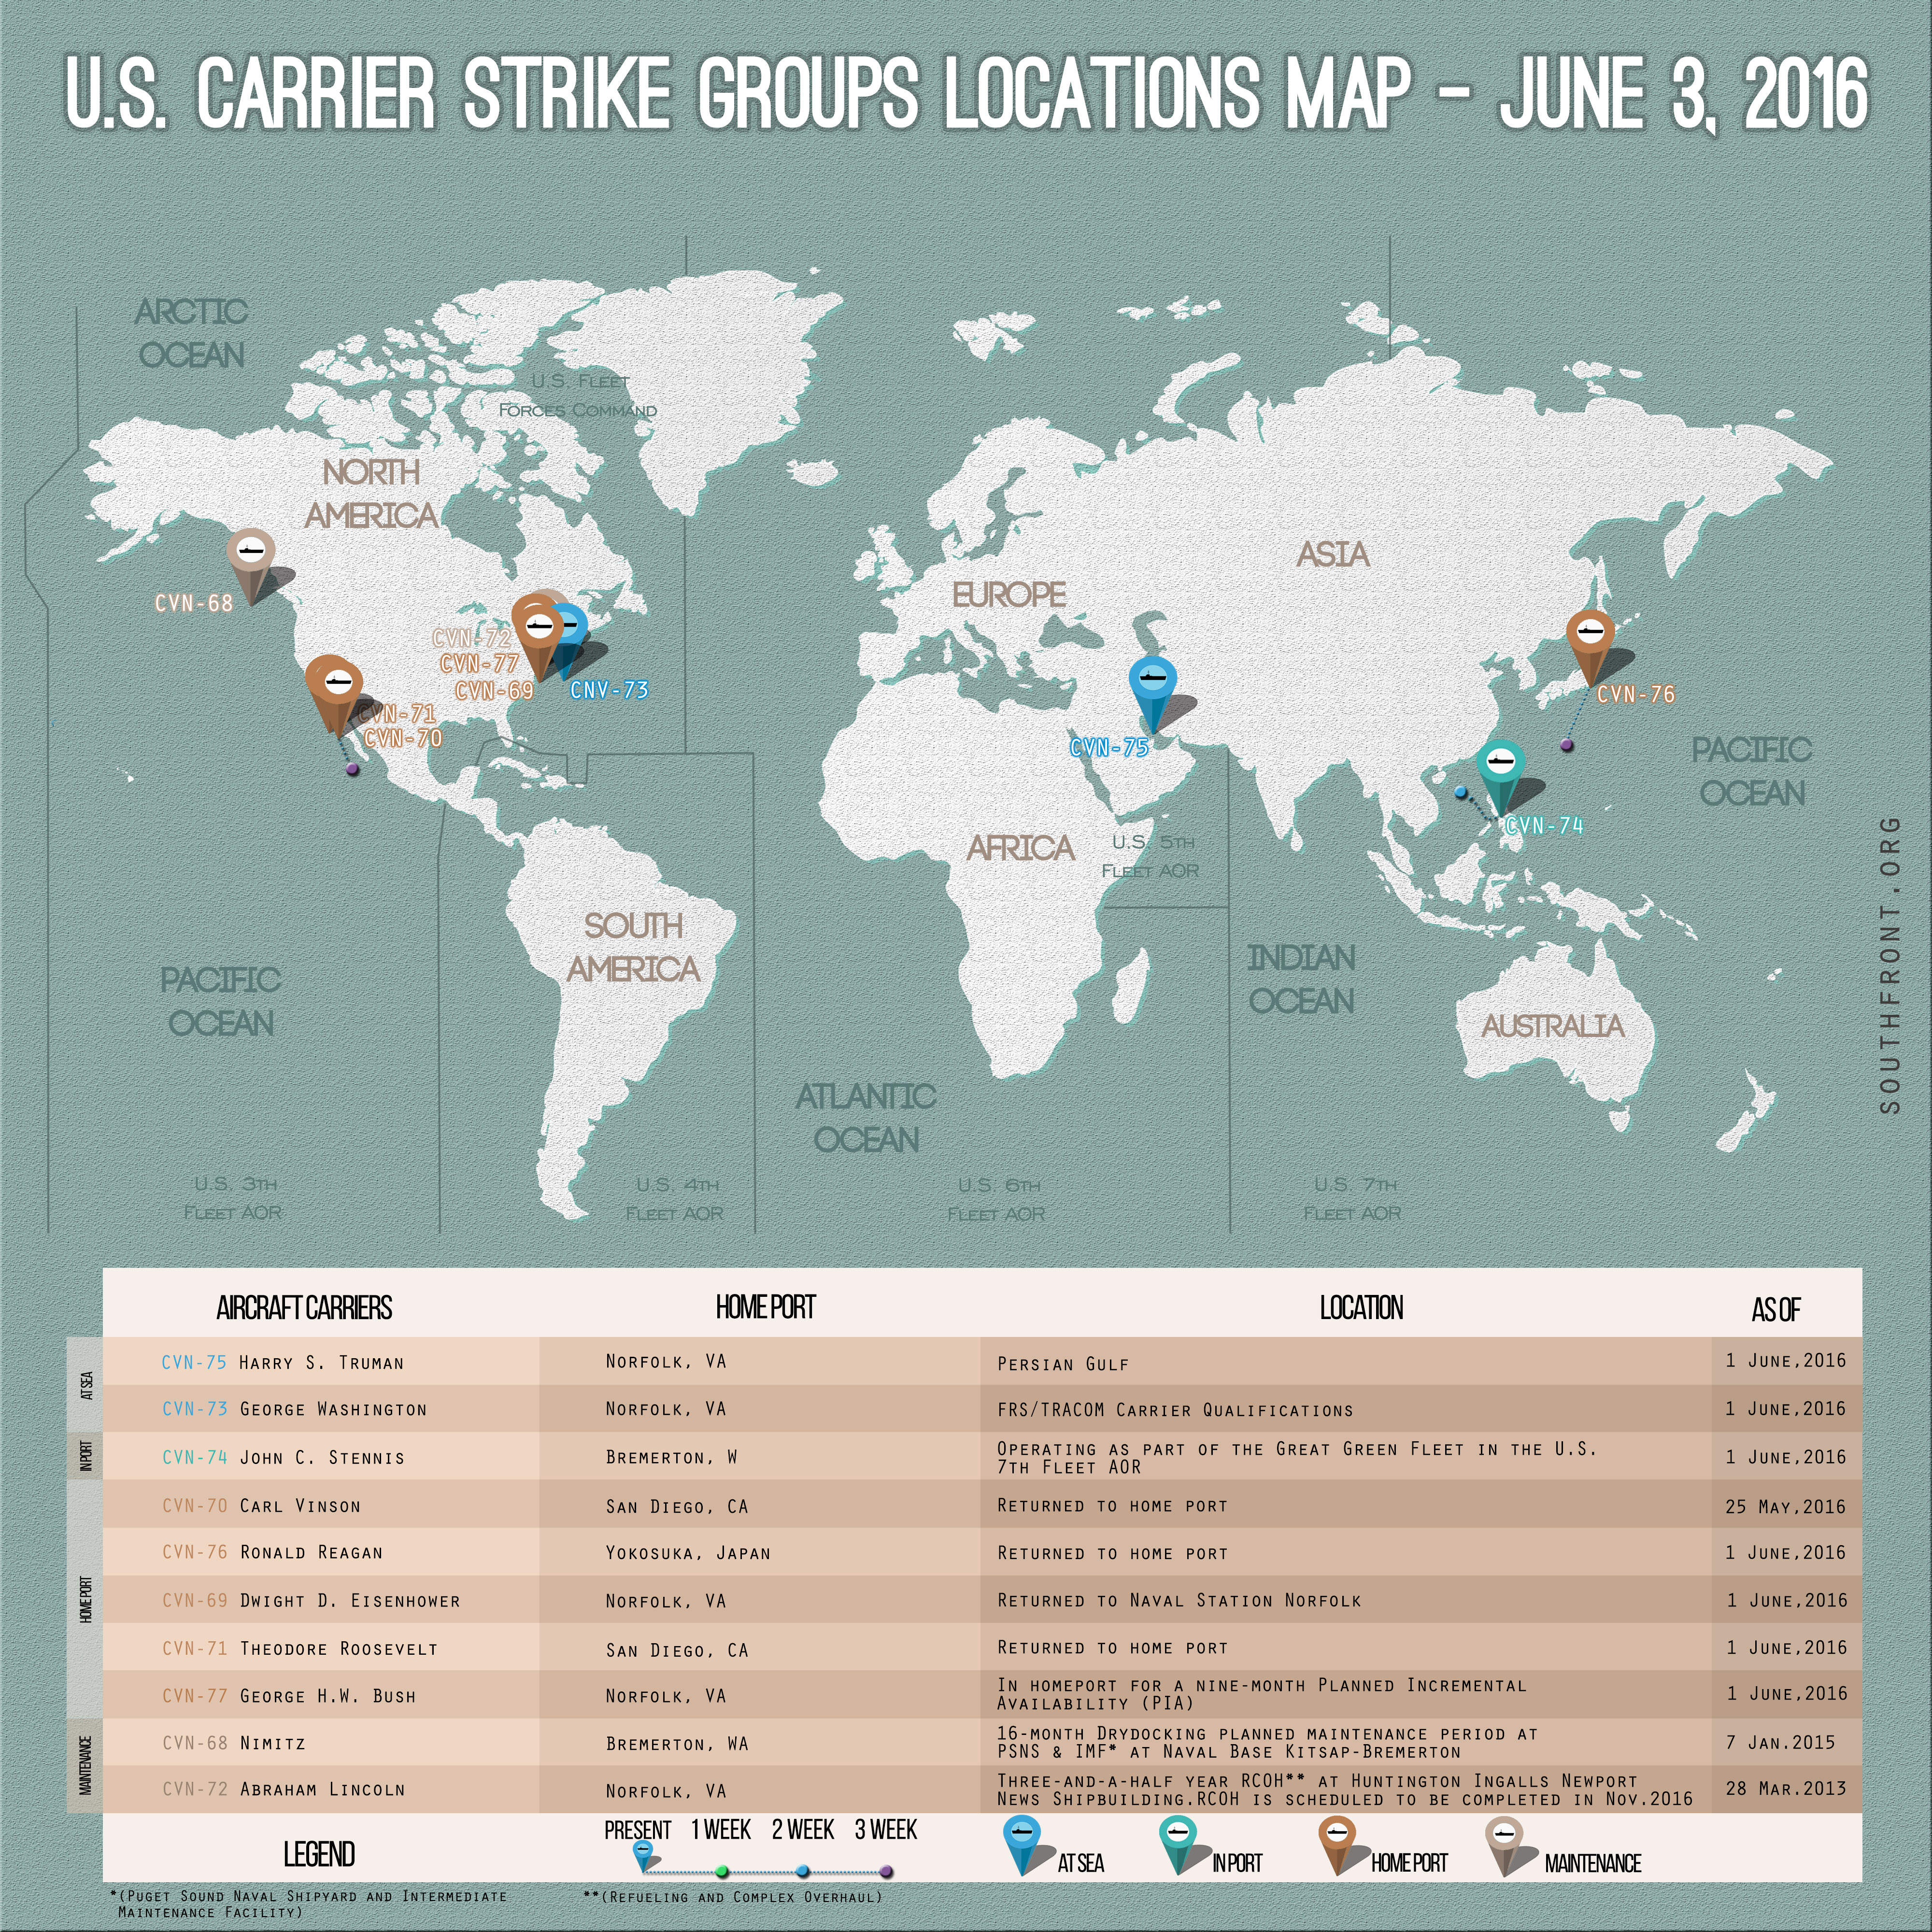 U.S. Carrier Strike Groups Locations Map – June 3, 2016